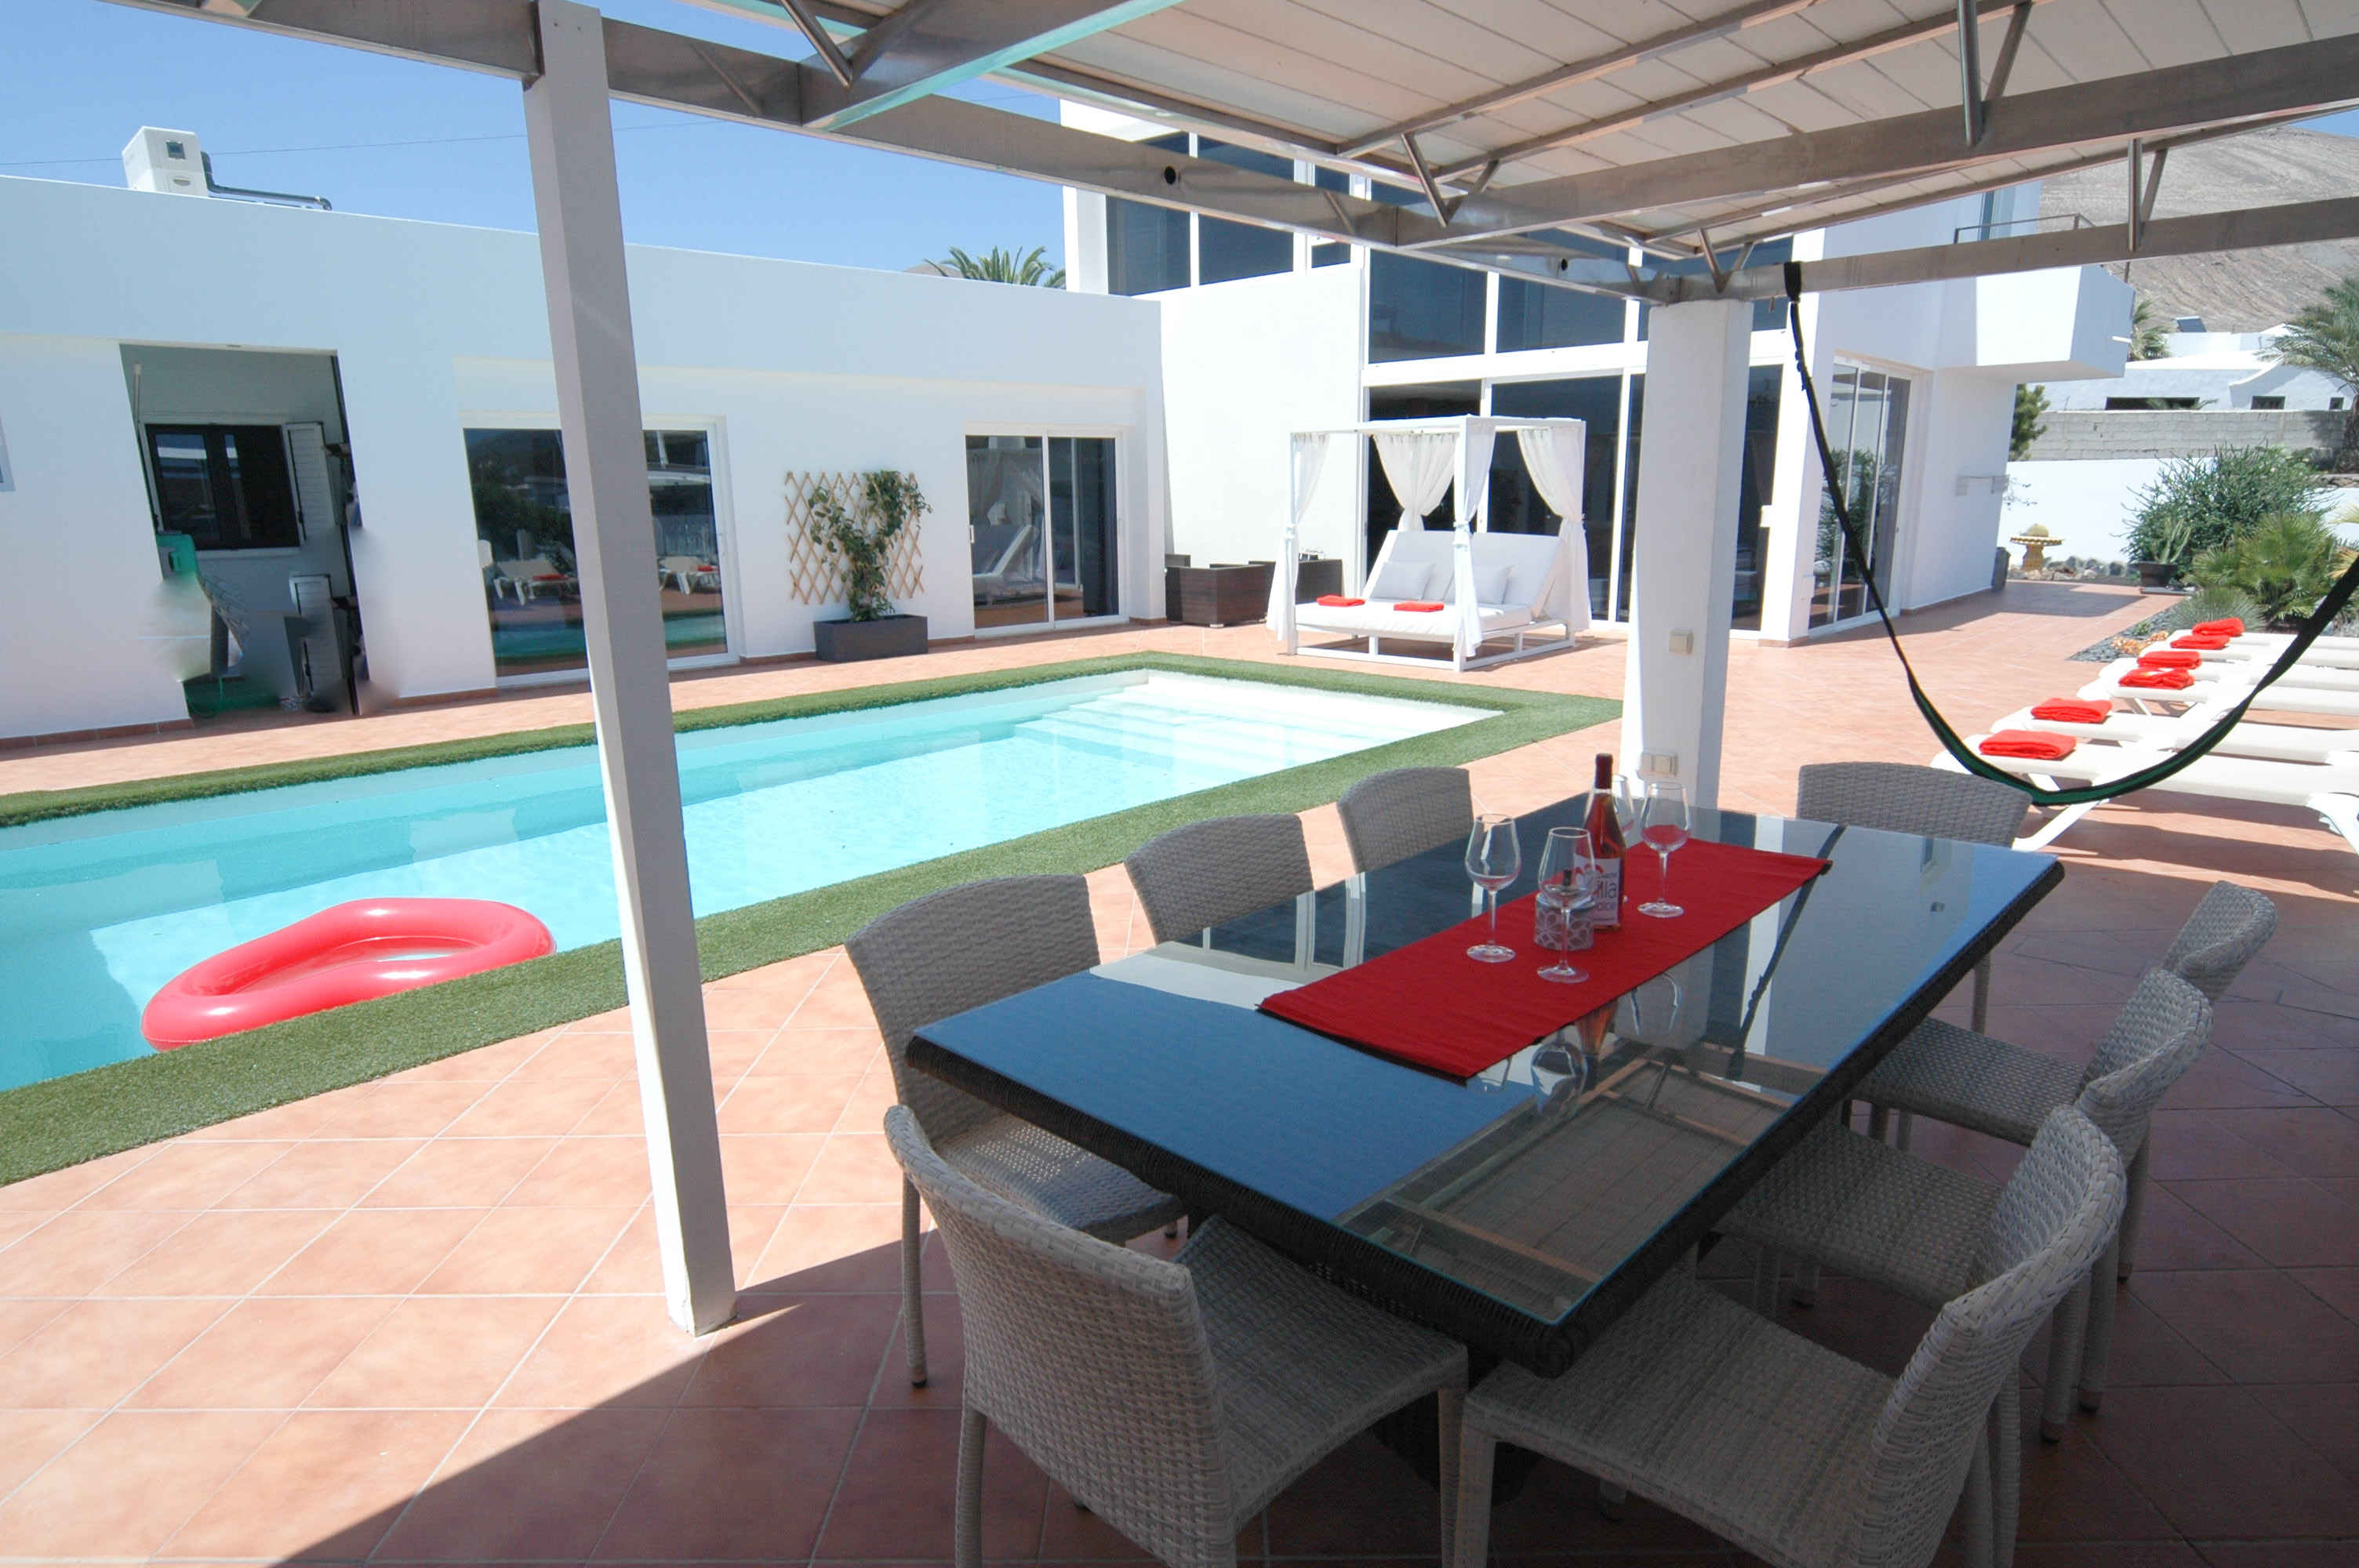 LVC318814 Undercover terrace for al fresco dining